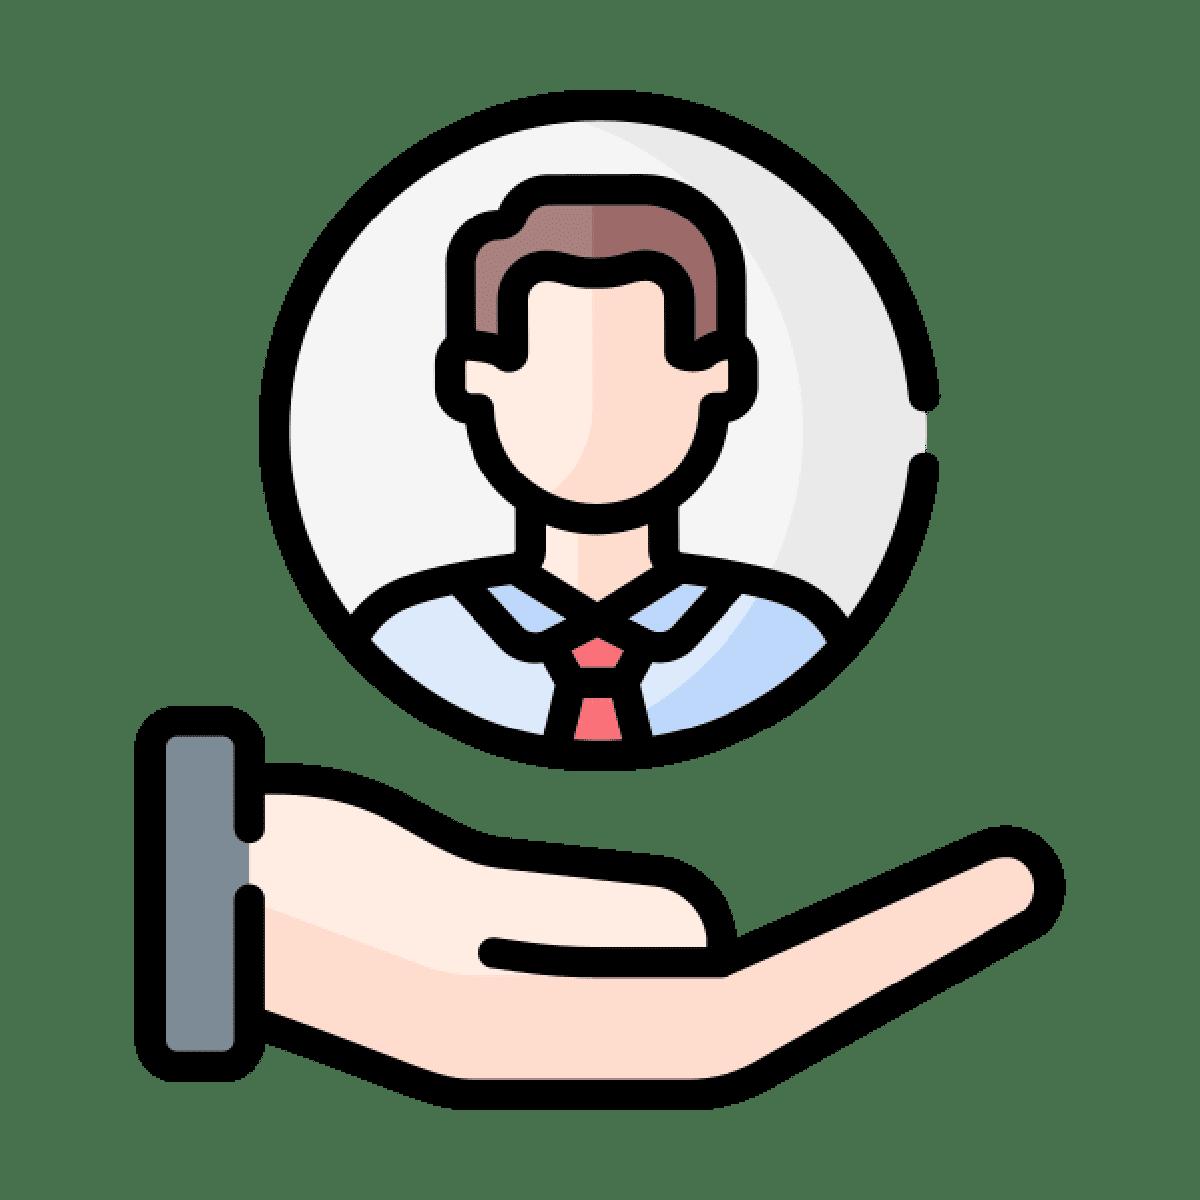 Build Operate Transfer IT Team icon